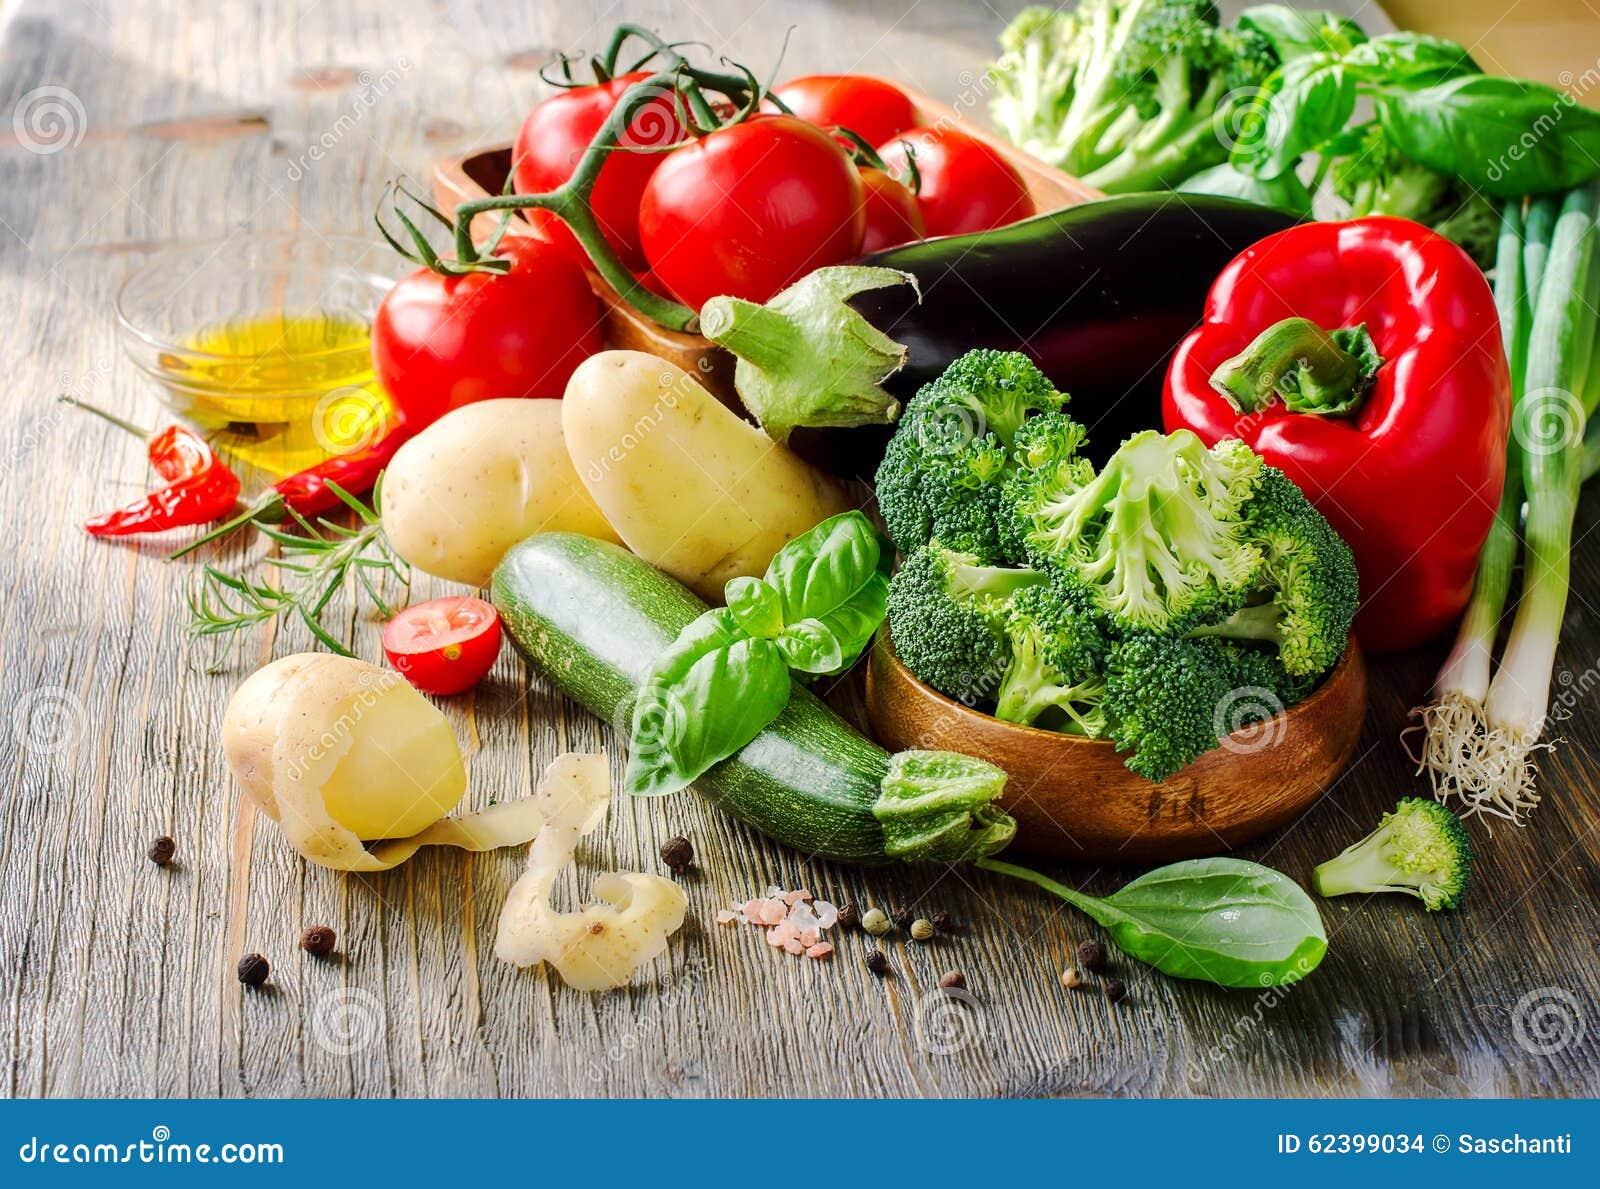 Nature S Table Vegan